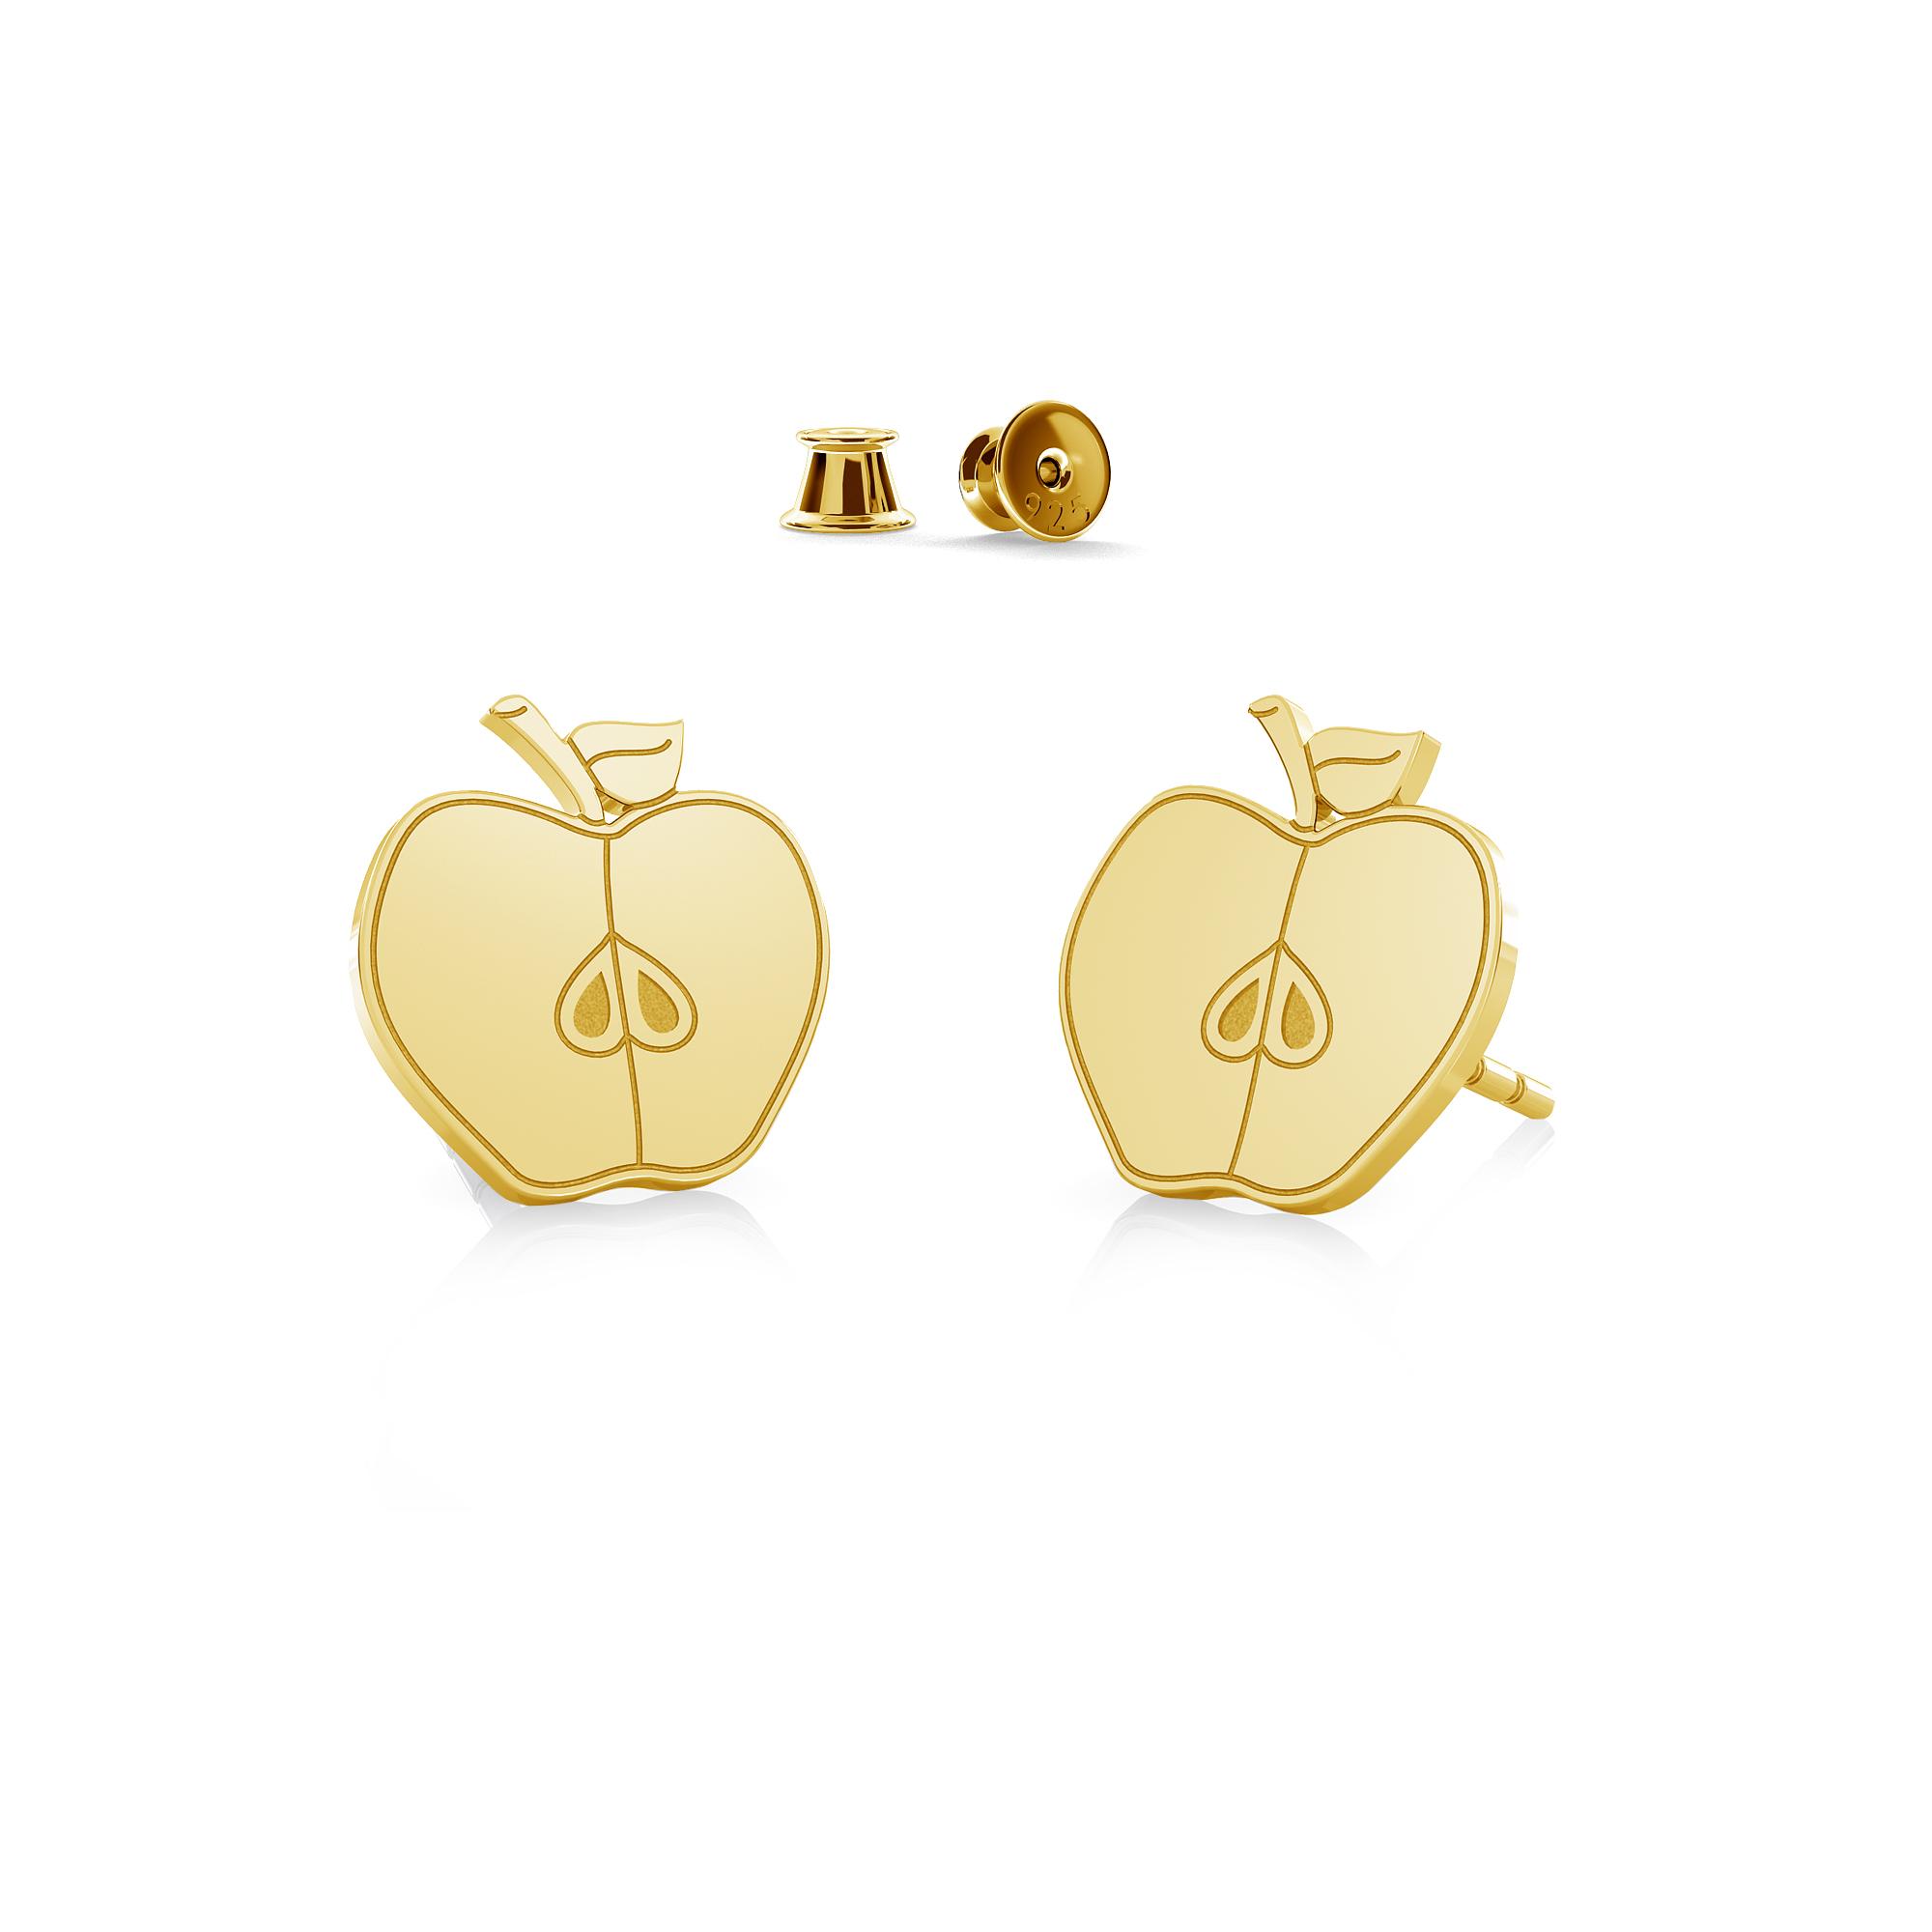 Chocolate earrings sterling silver 925 - ARÔME